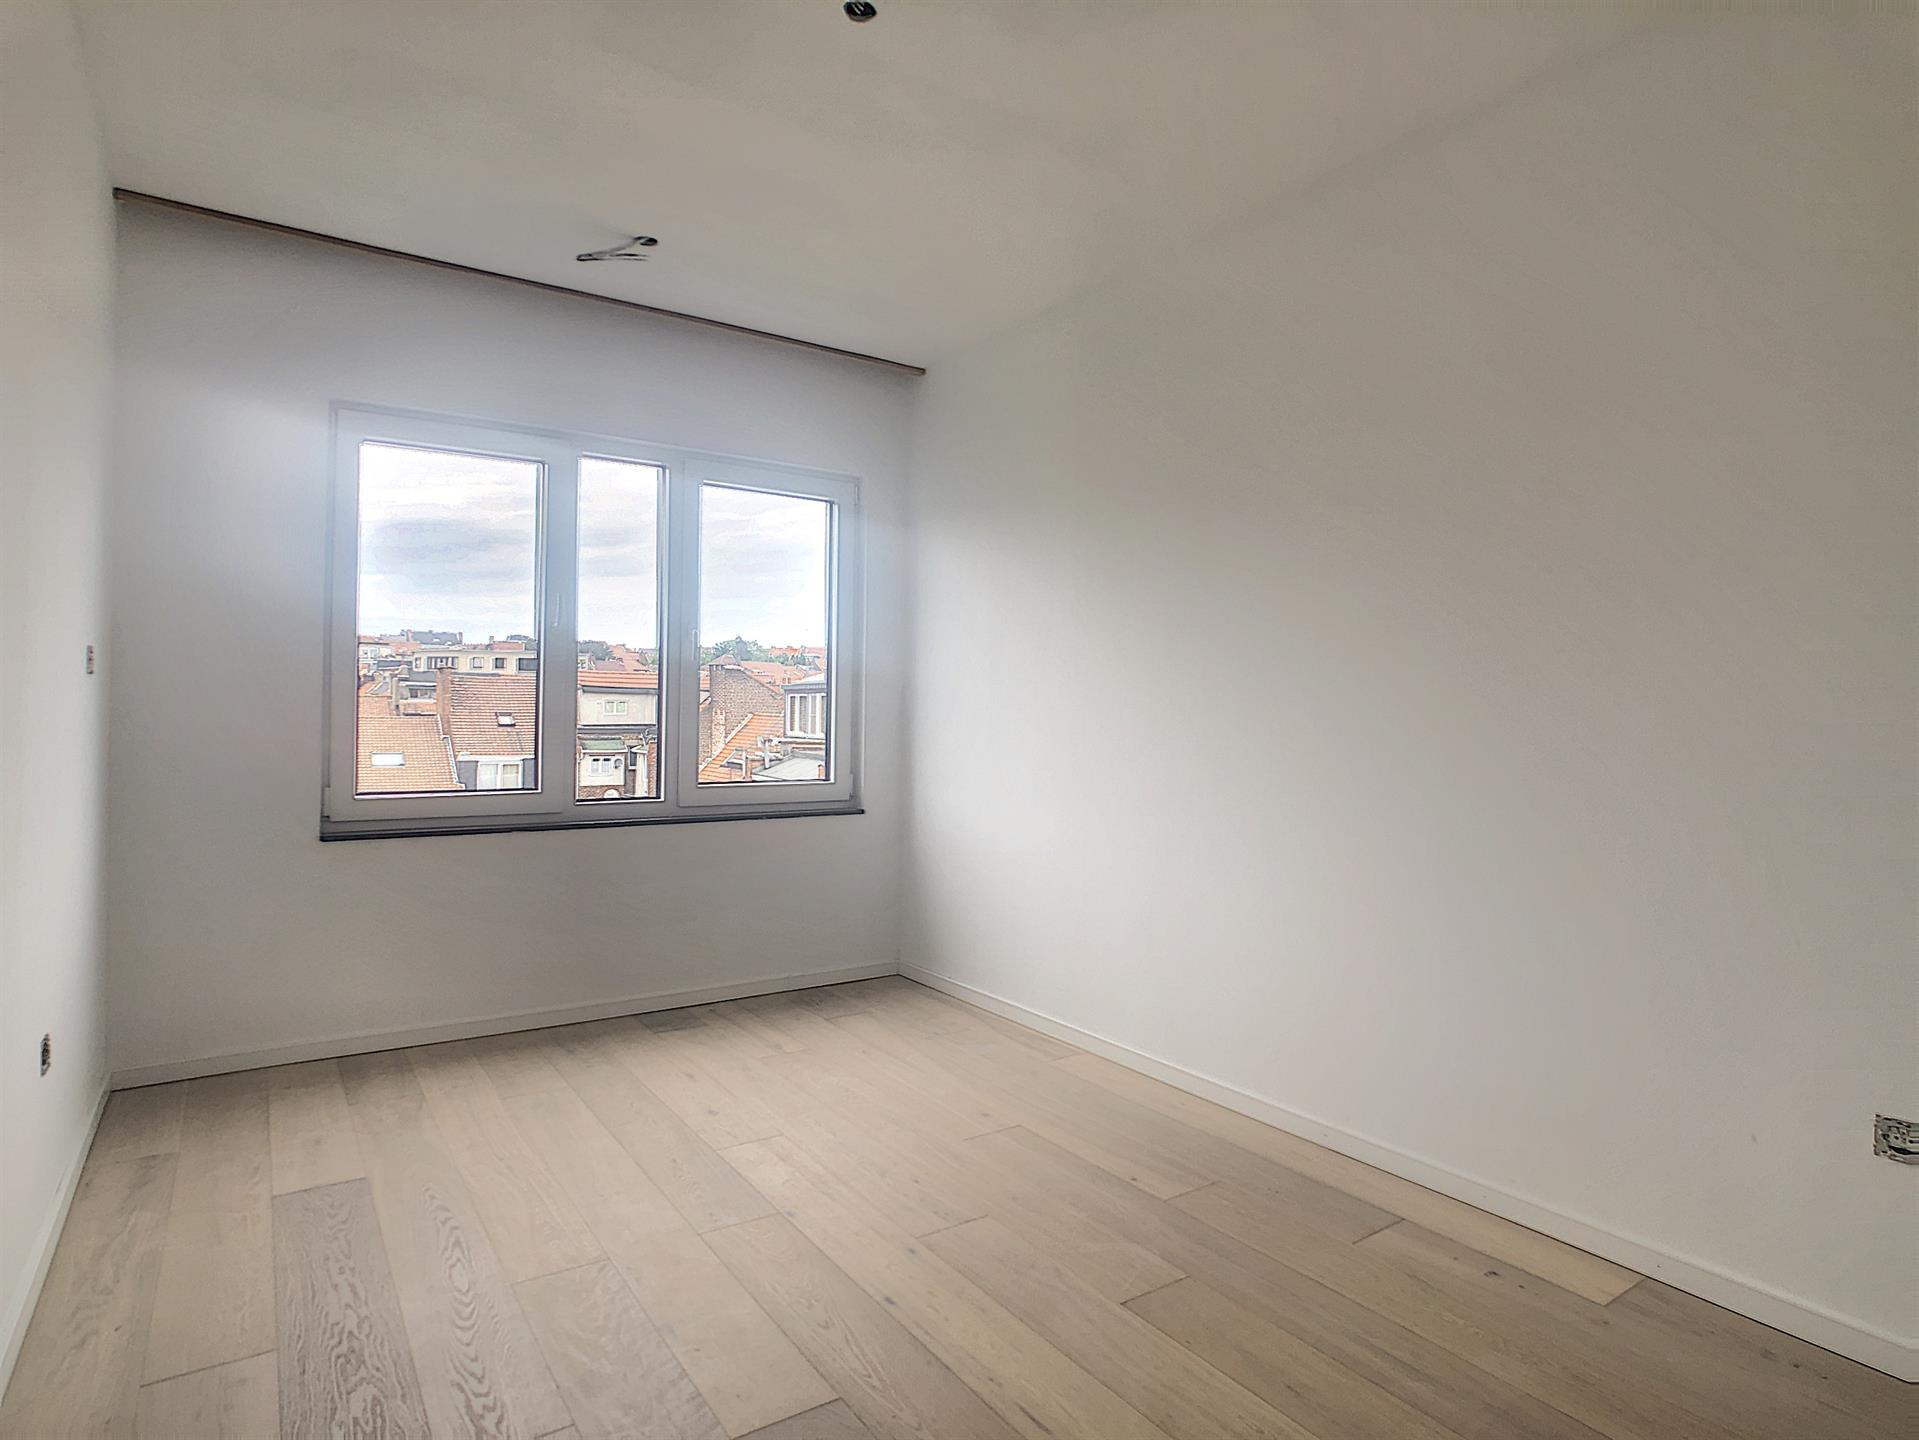 Appartement - Anderlecht - #4252377-46